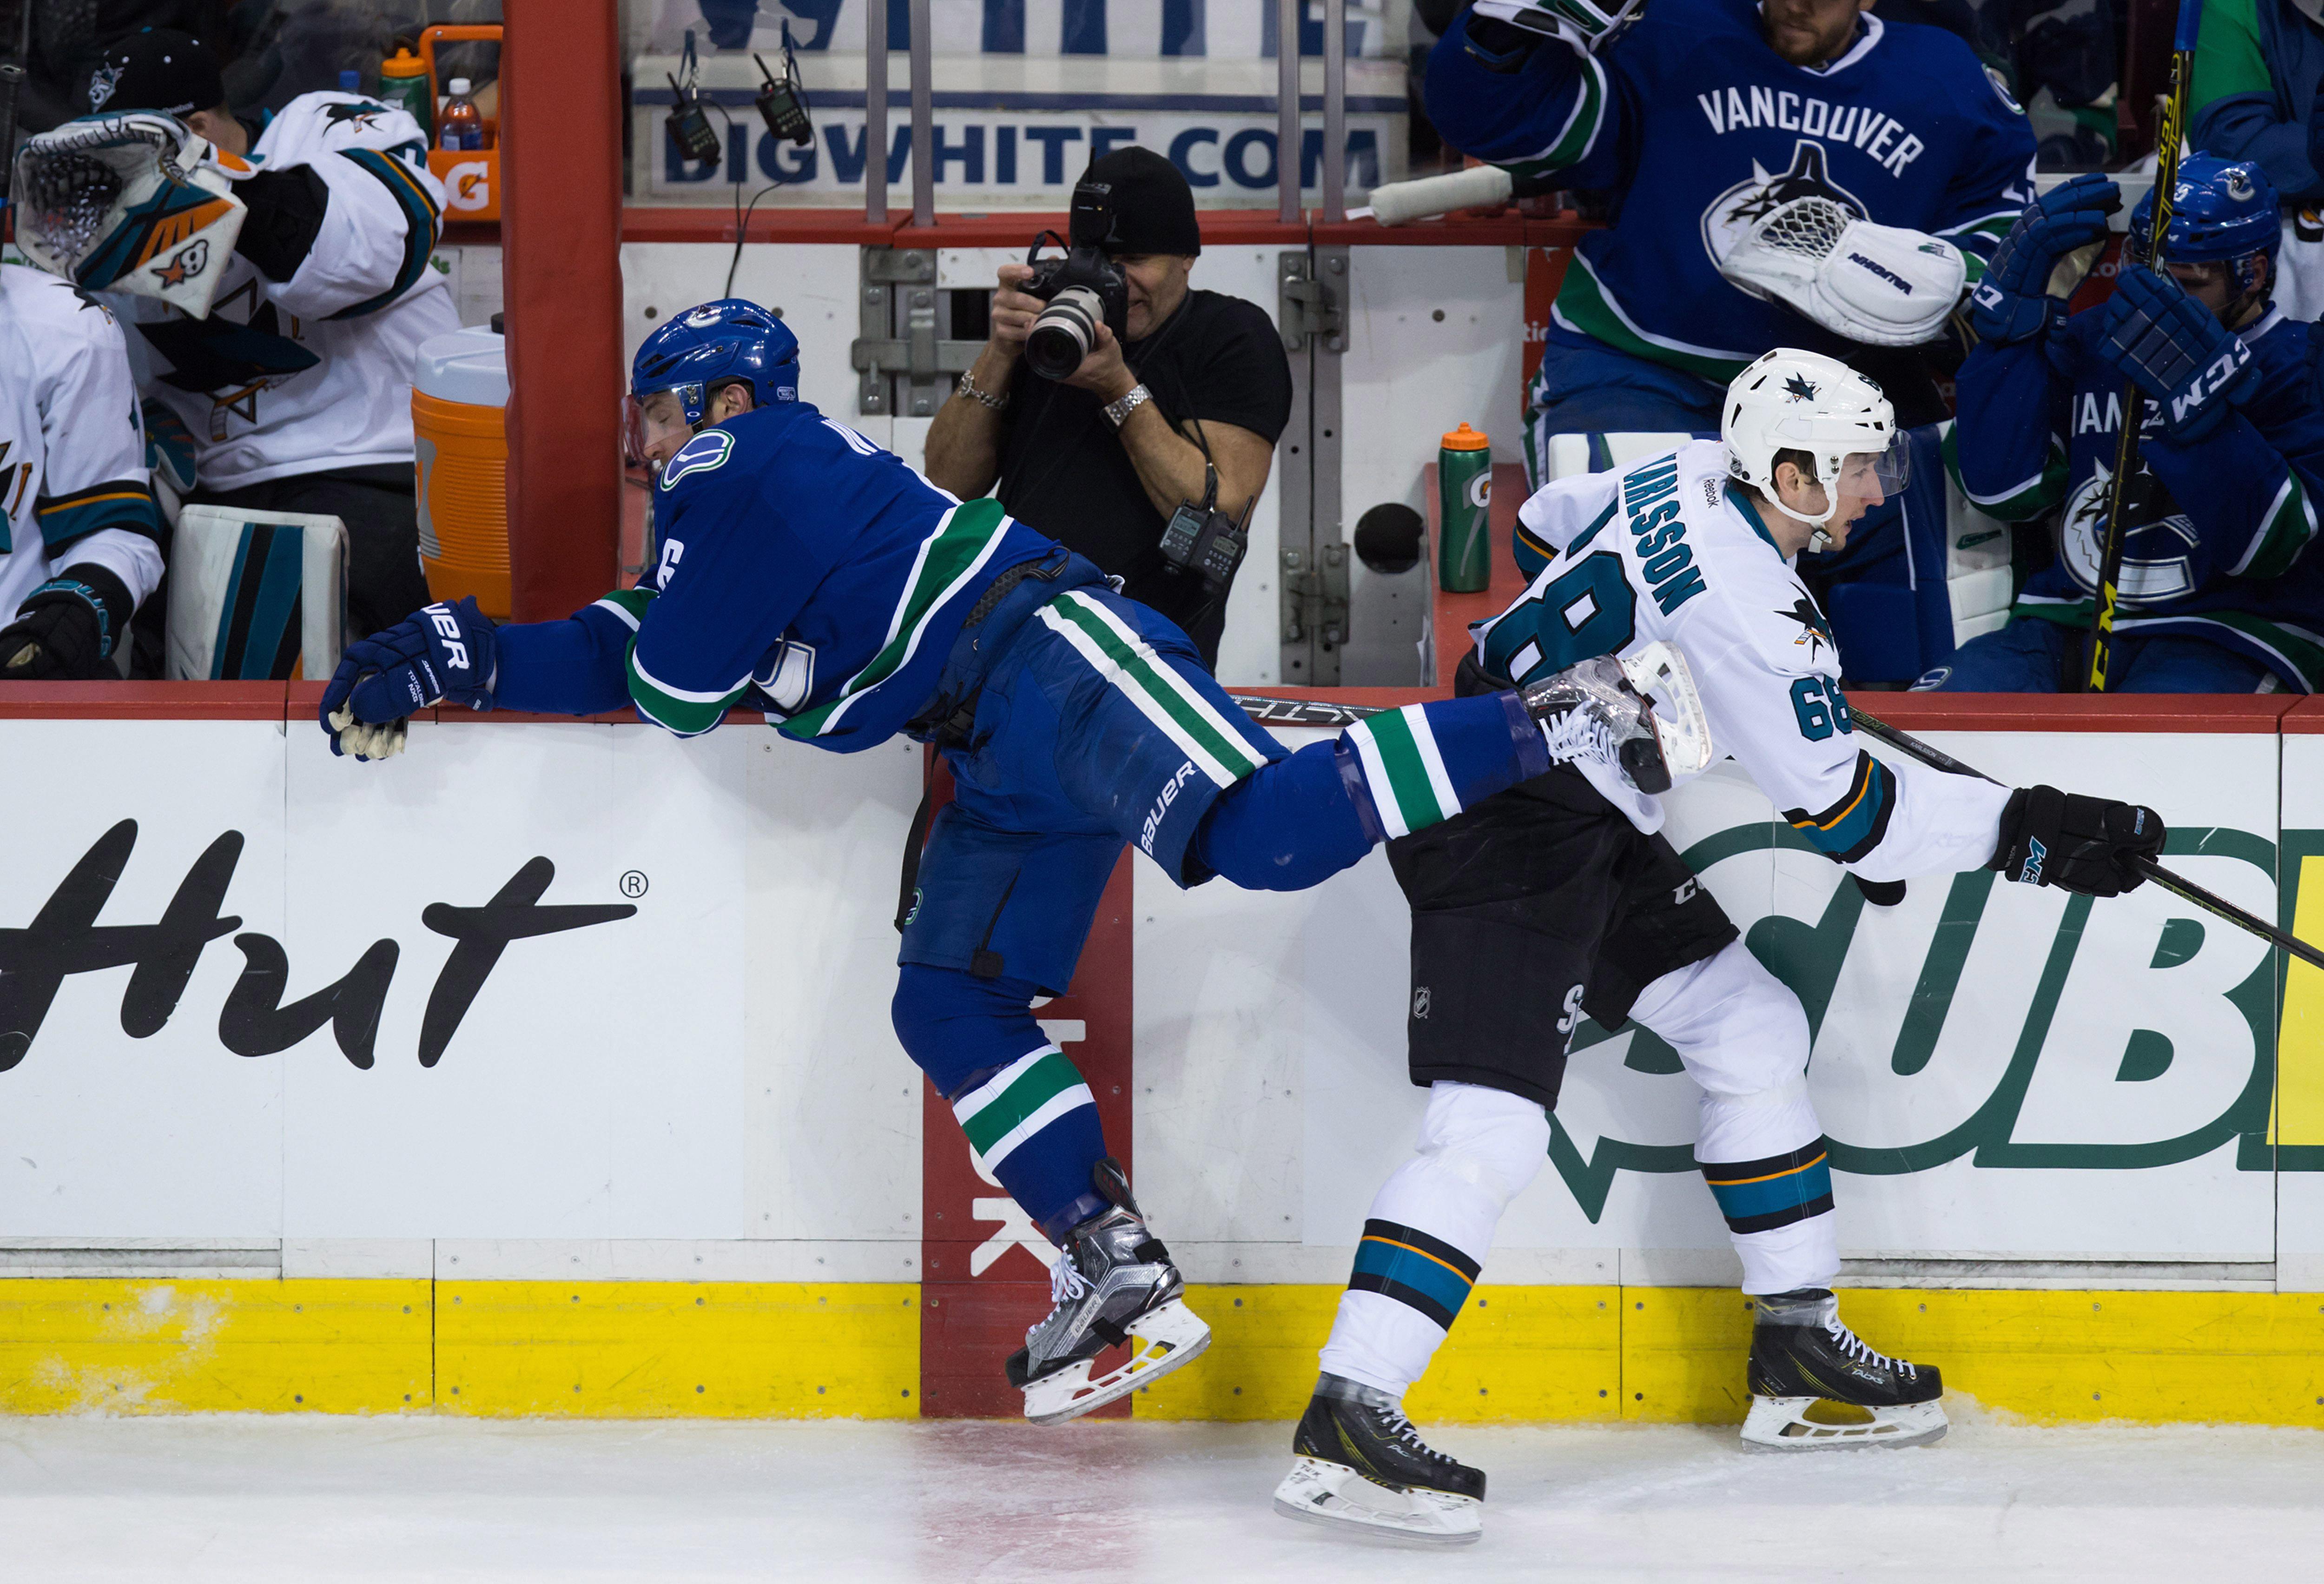 Vancouver Canucks' Yannick Weber, left, of Switzerland, and San Jose Sharks' Melker Karlsson, of Sweden, collide during second period NHL hockey action in Vancouver on Sunday, Feb. 28, 2016. (Darryl Dyck/The Canadian Press via AP) MANDATORY CREDIT